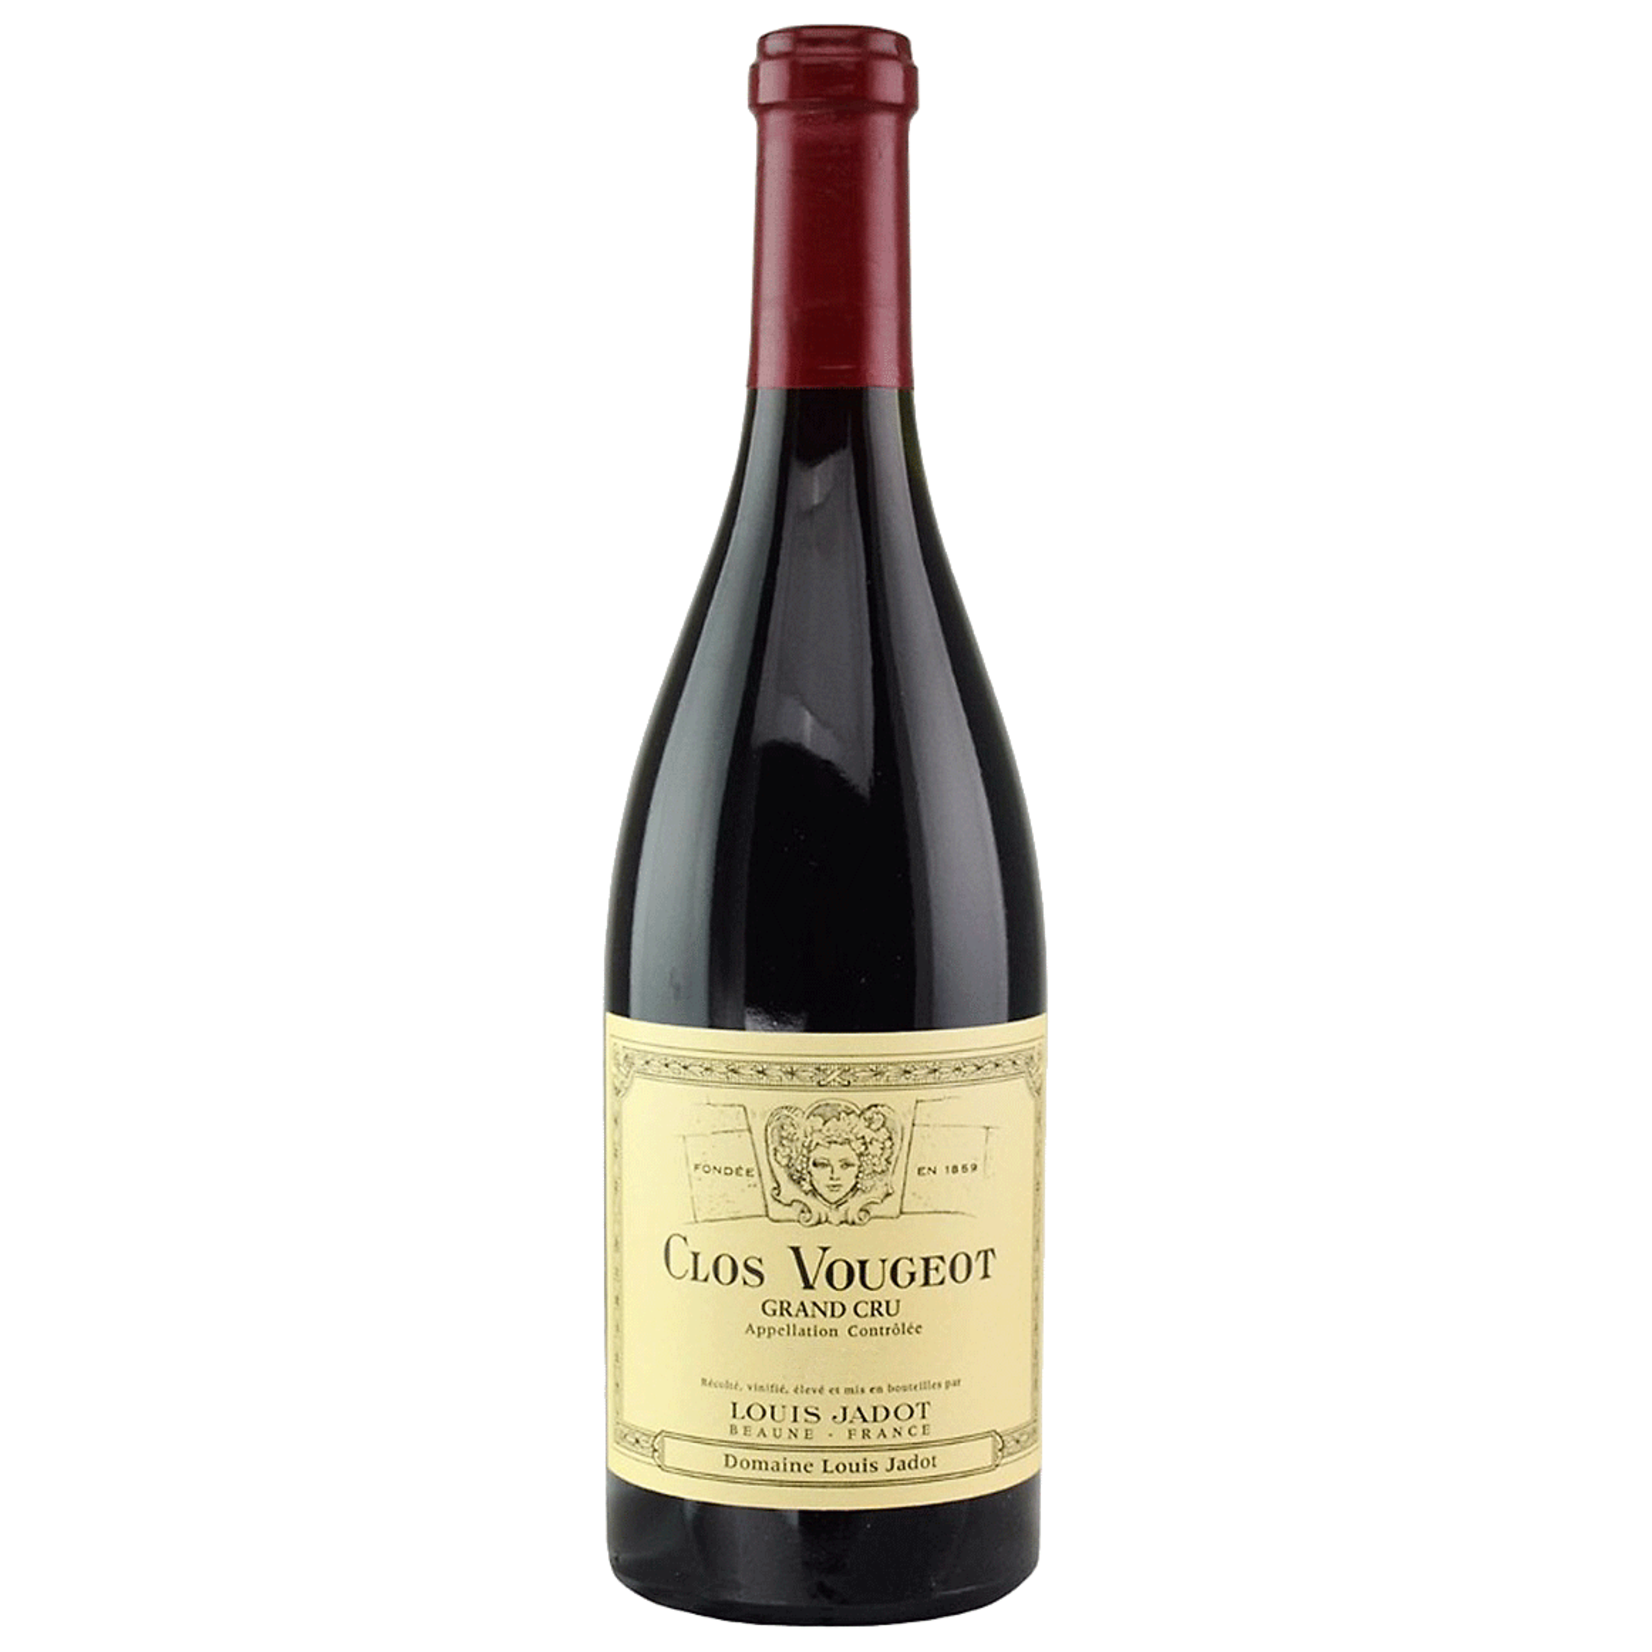 Wine Clos Vougeot Grand Cru, Domaine Louis Jadot 2019